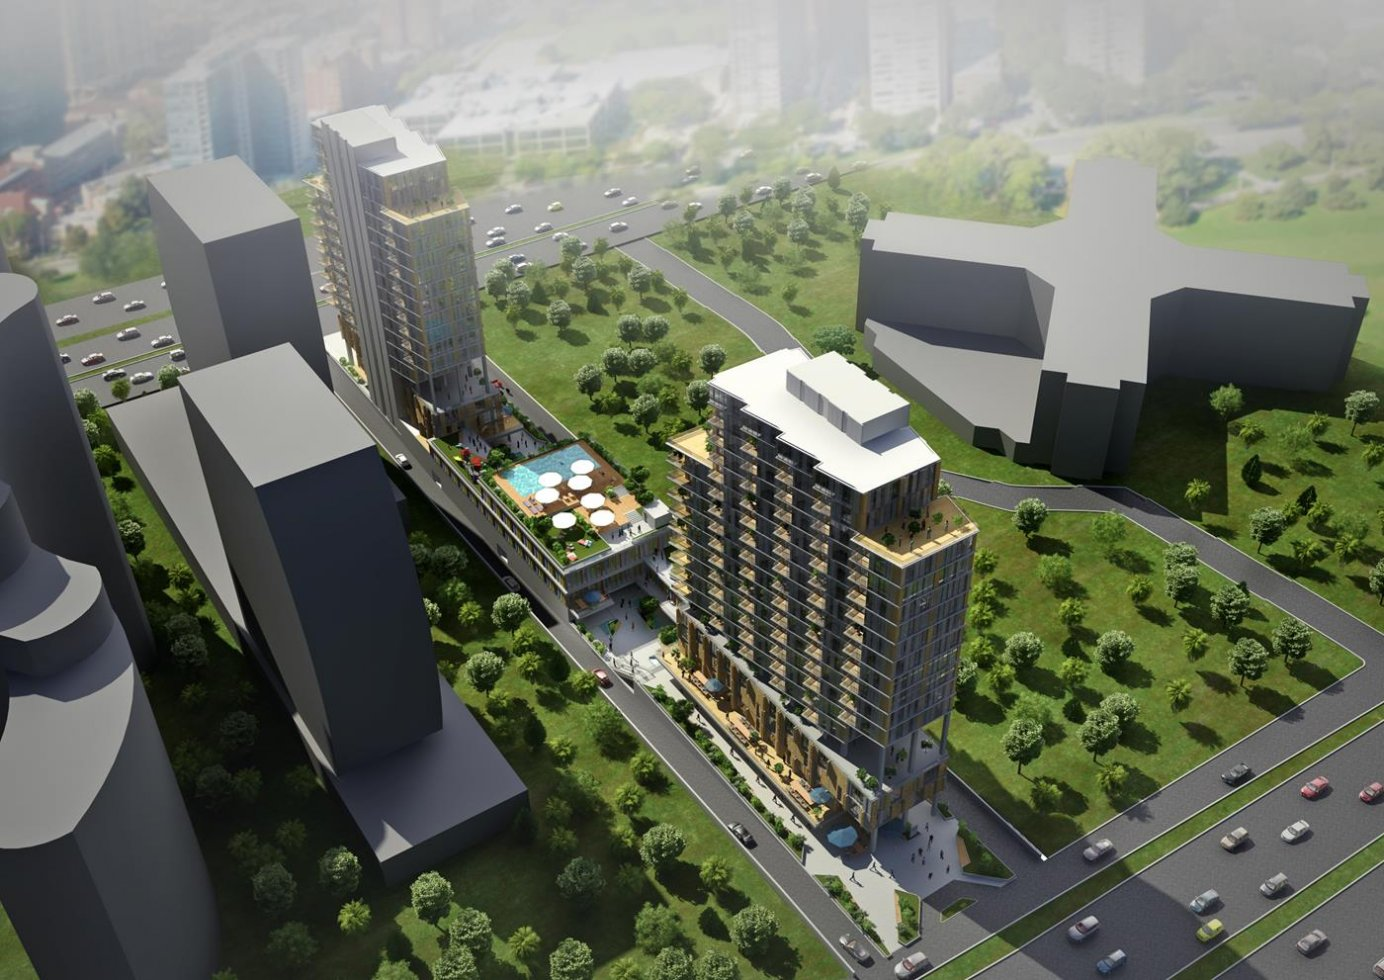 Aşçıoğlu Ataköy Konut Projesi